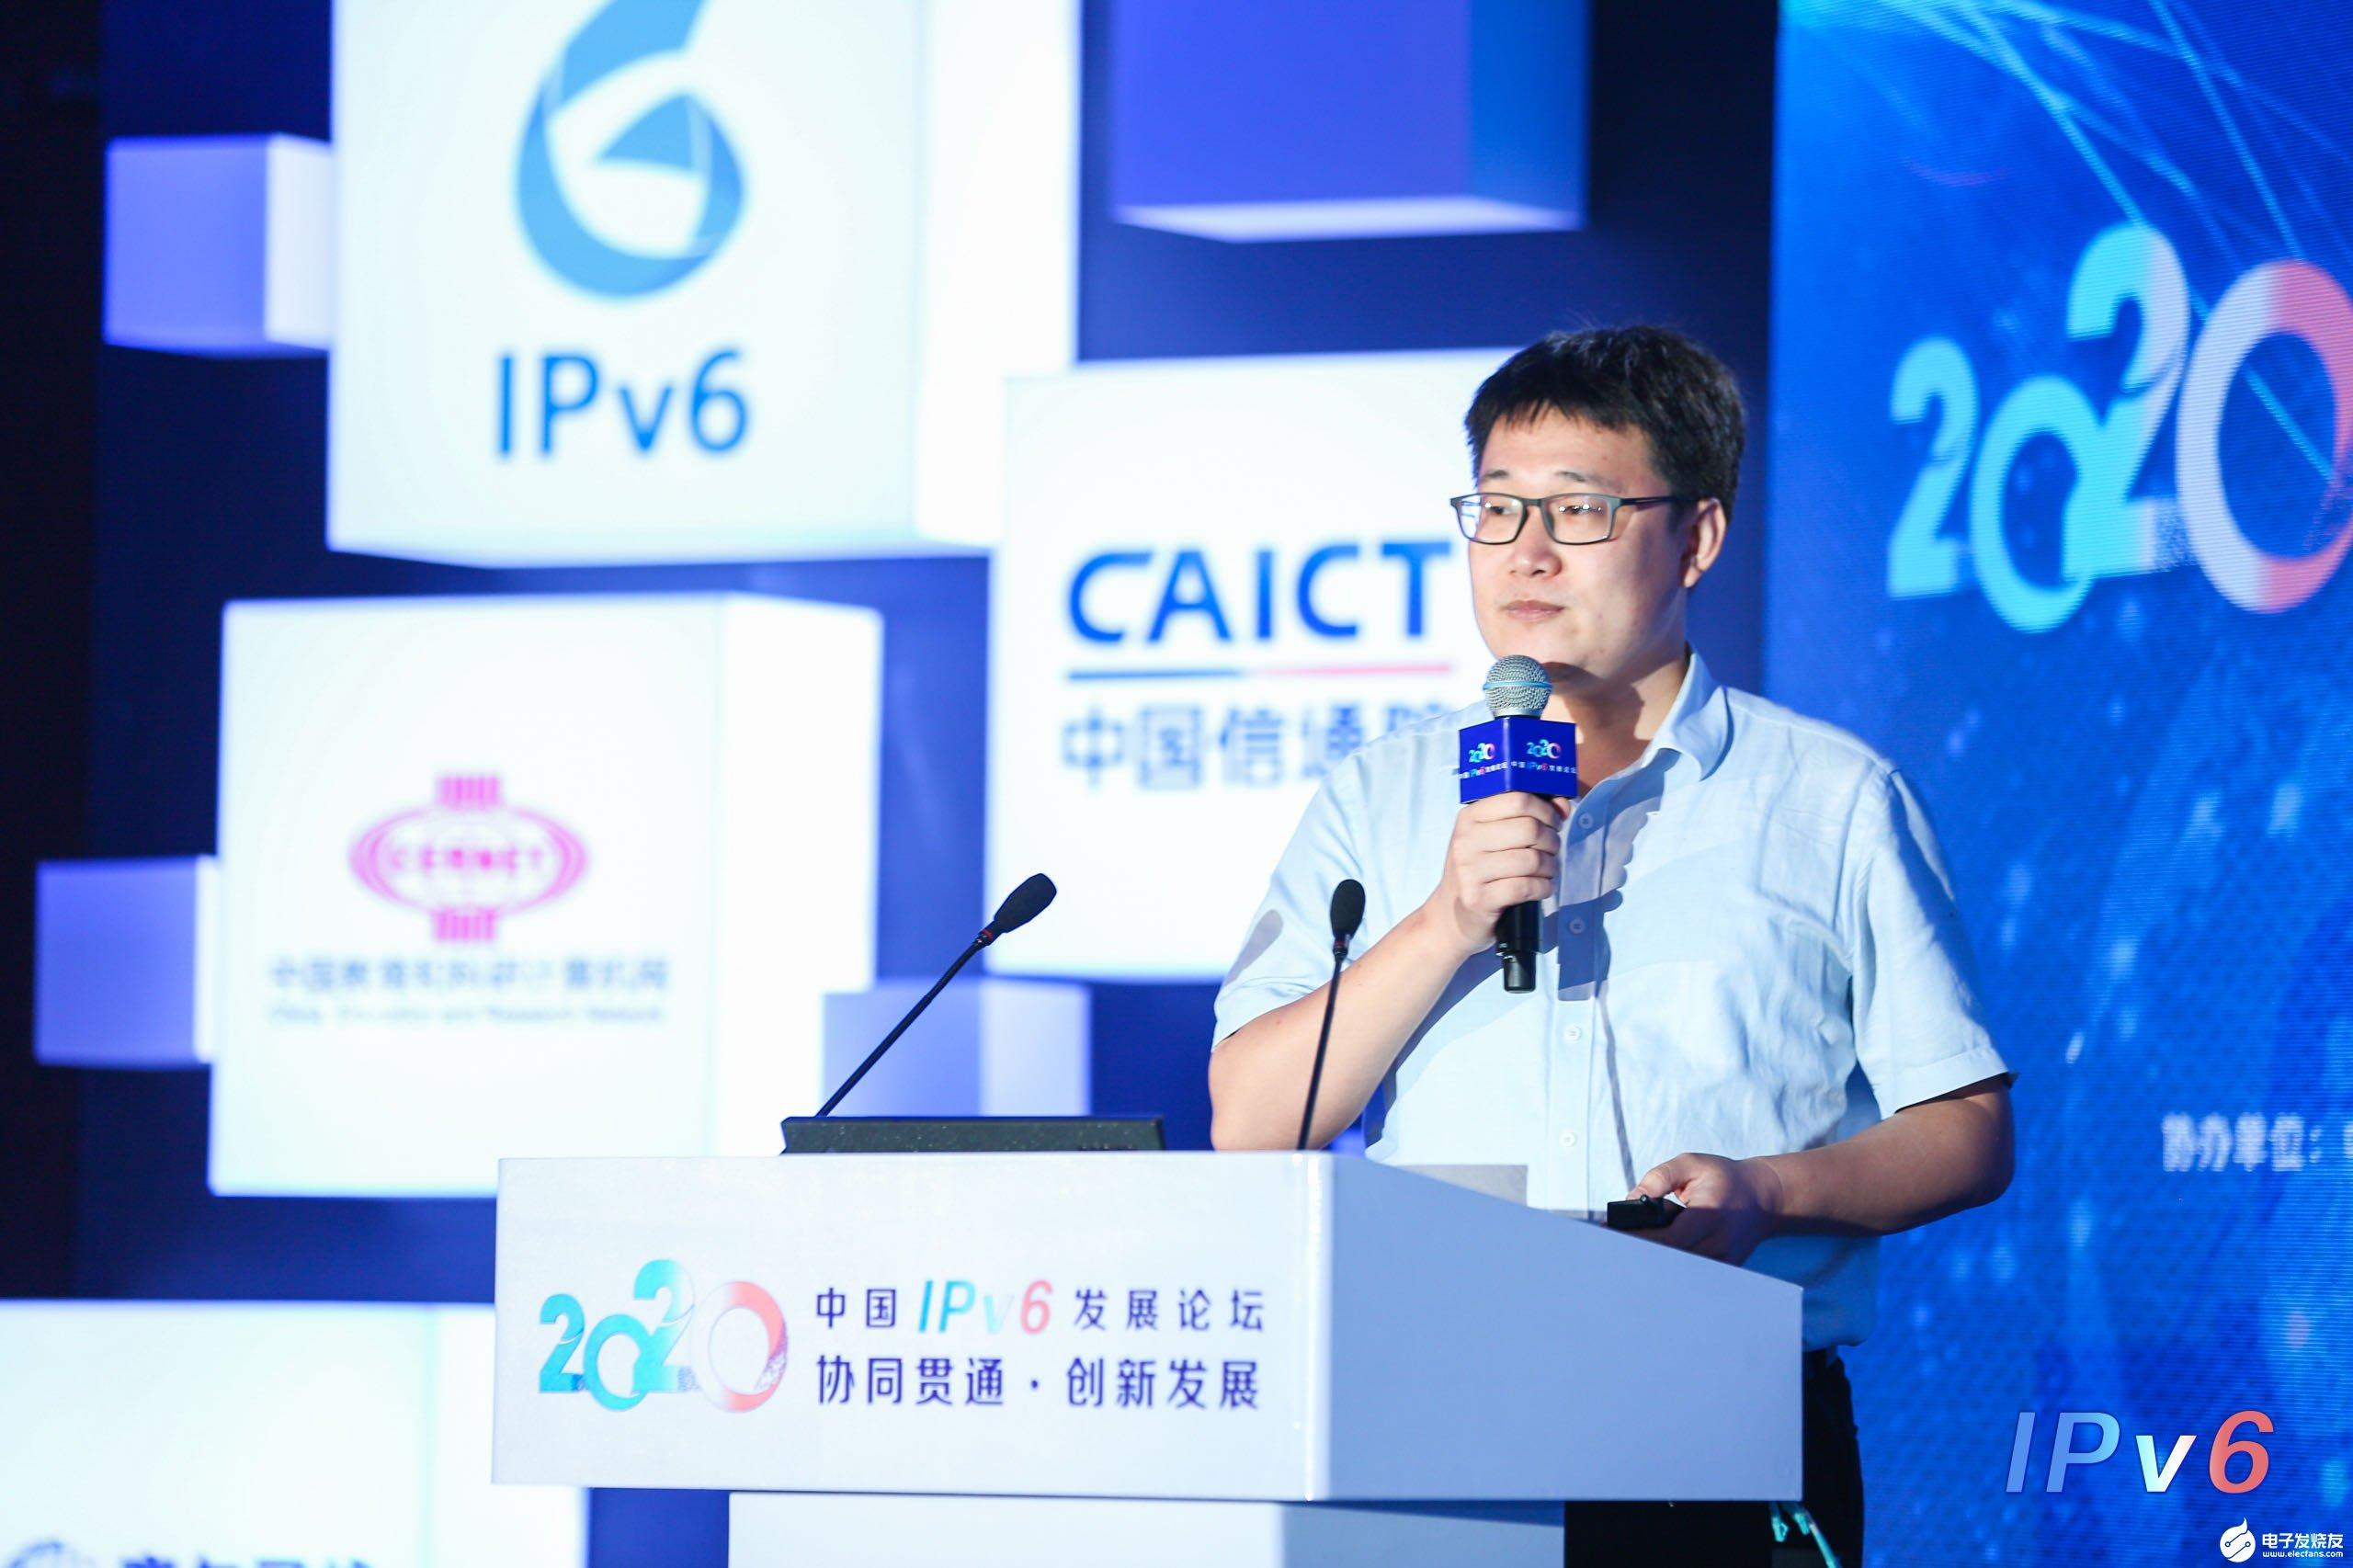 IPv6+云邊網協同和承載網切片,積極推動BIER創新方案